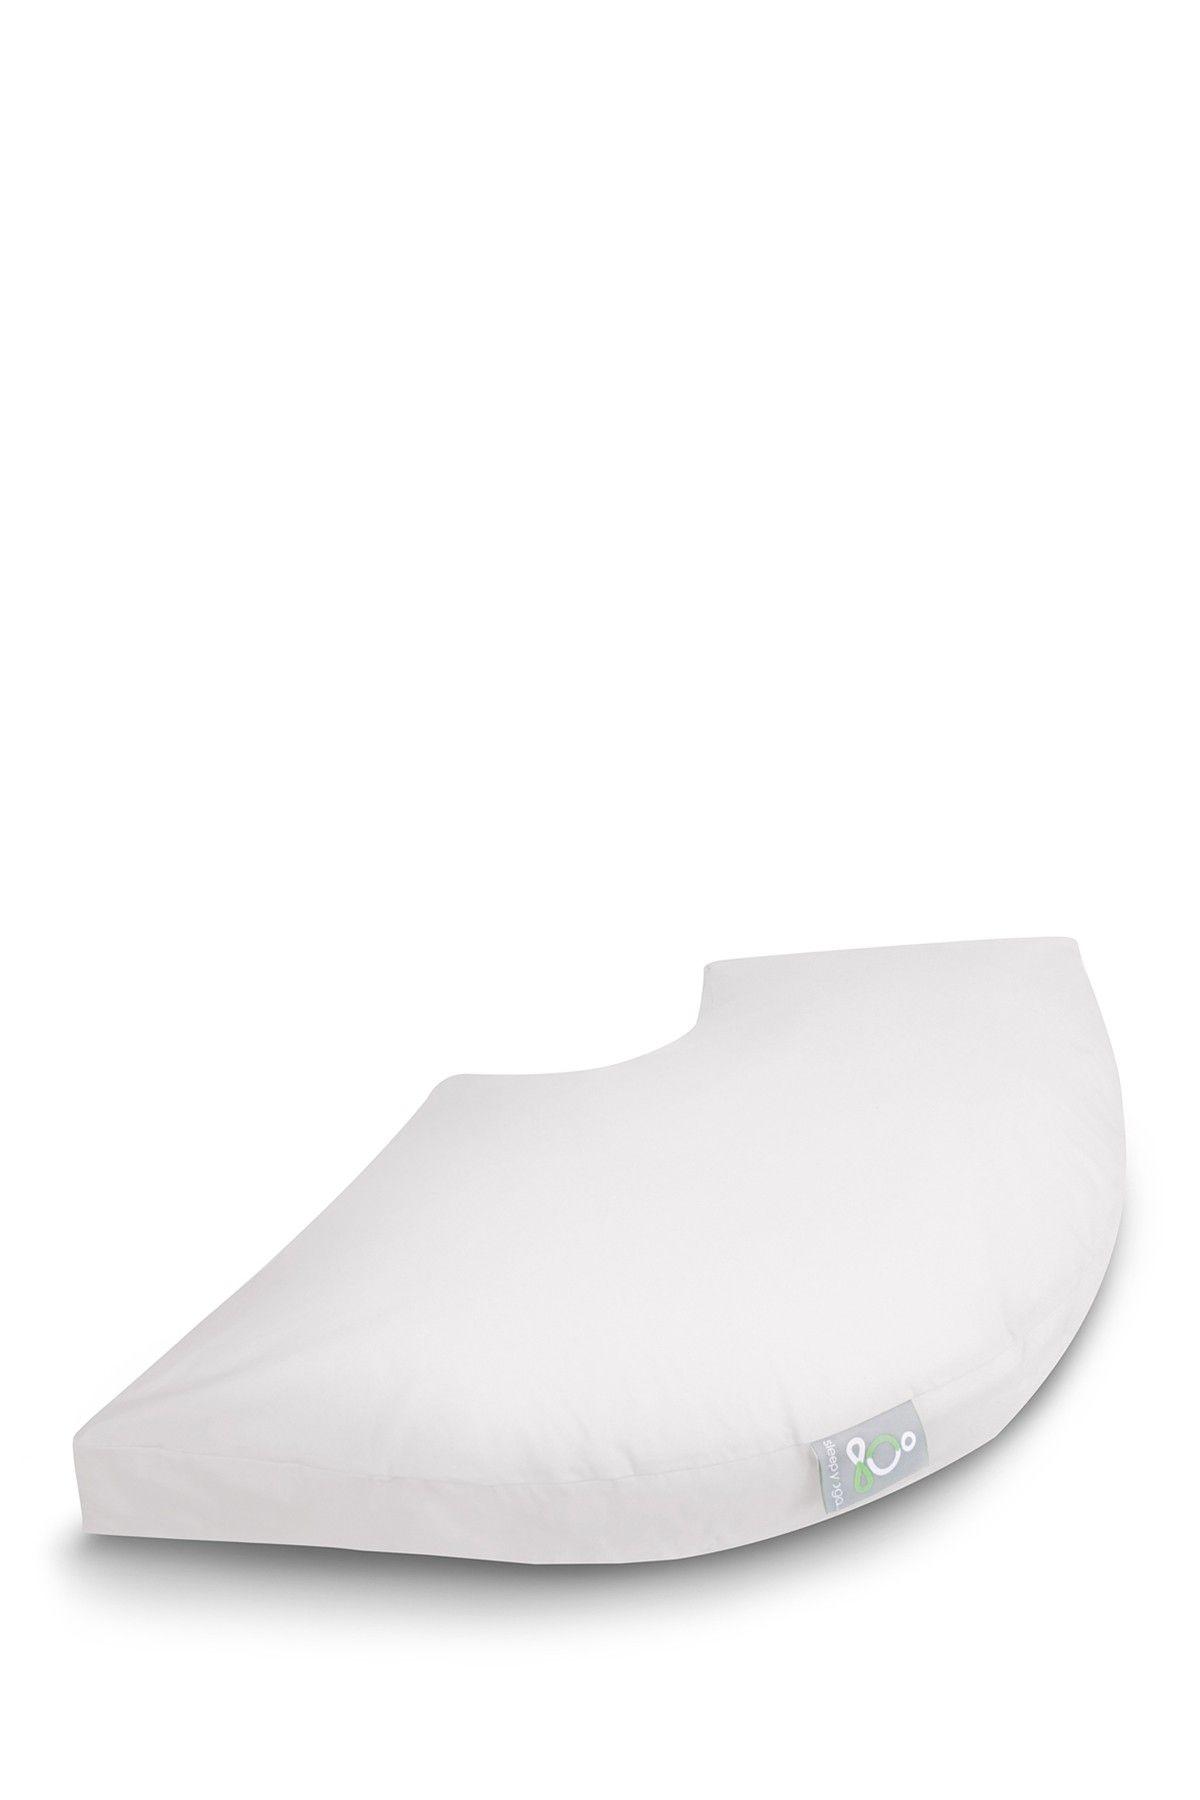 rio home sleep yoga side sleeper pillow